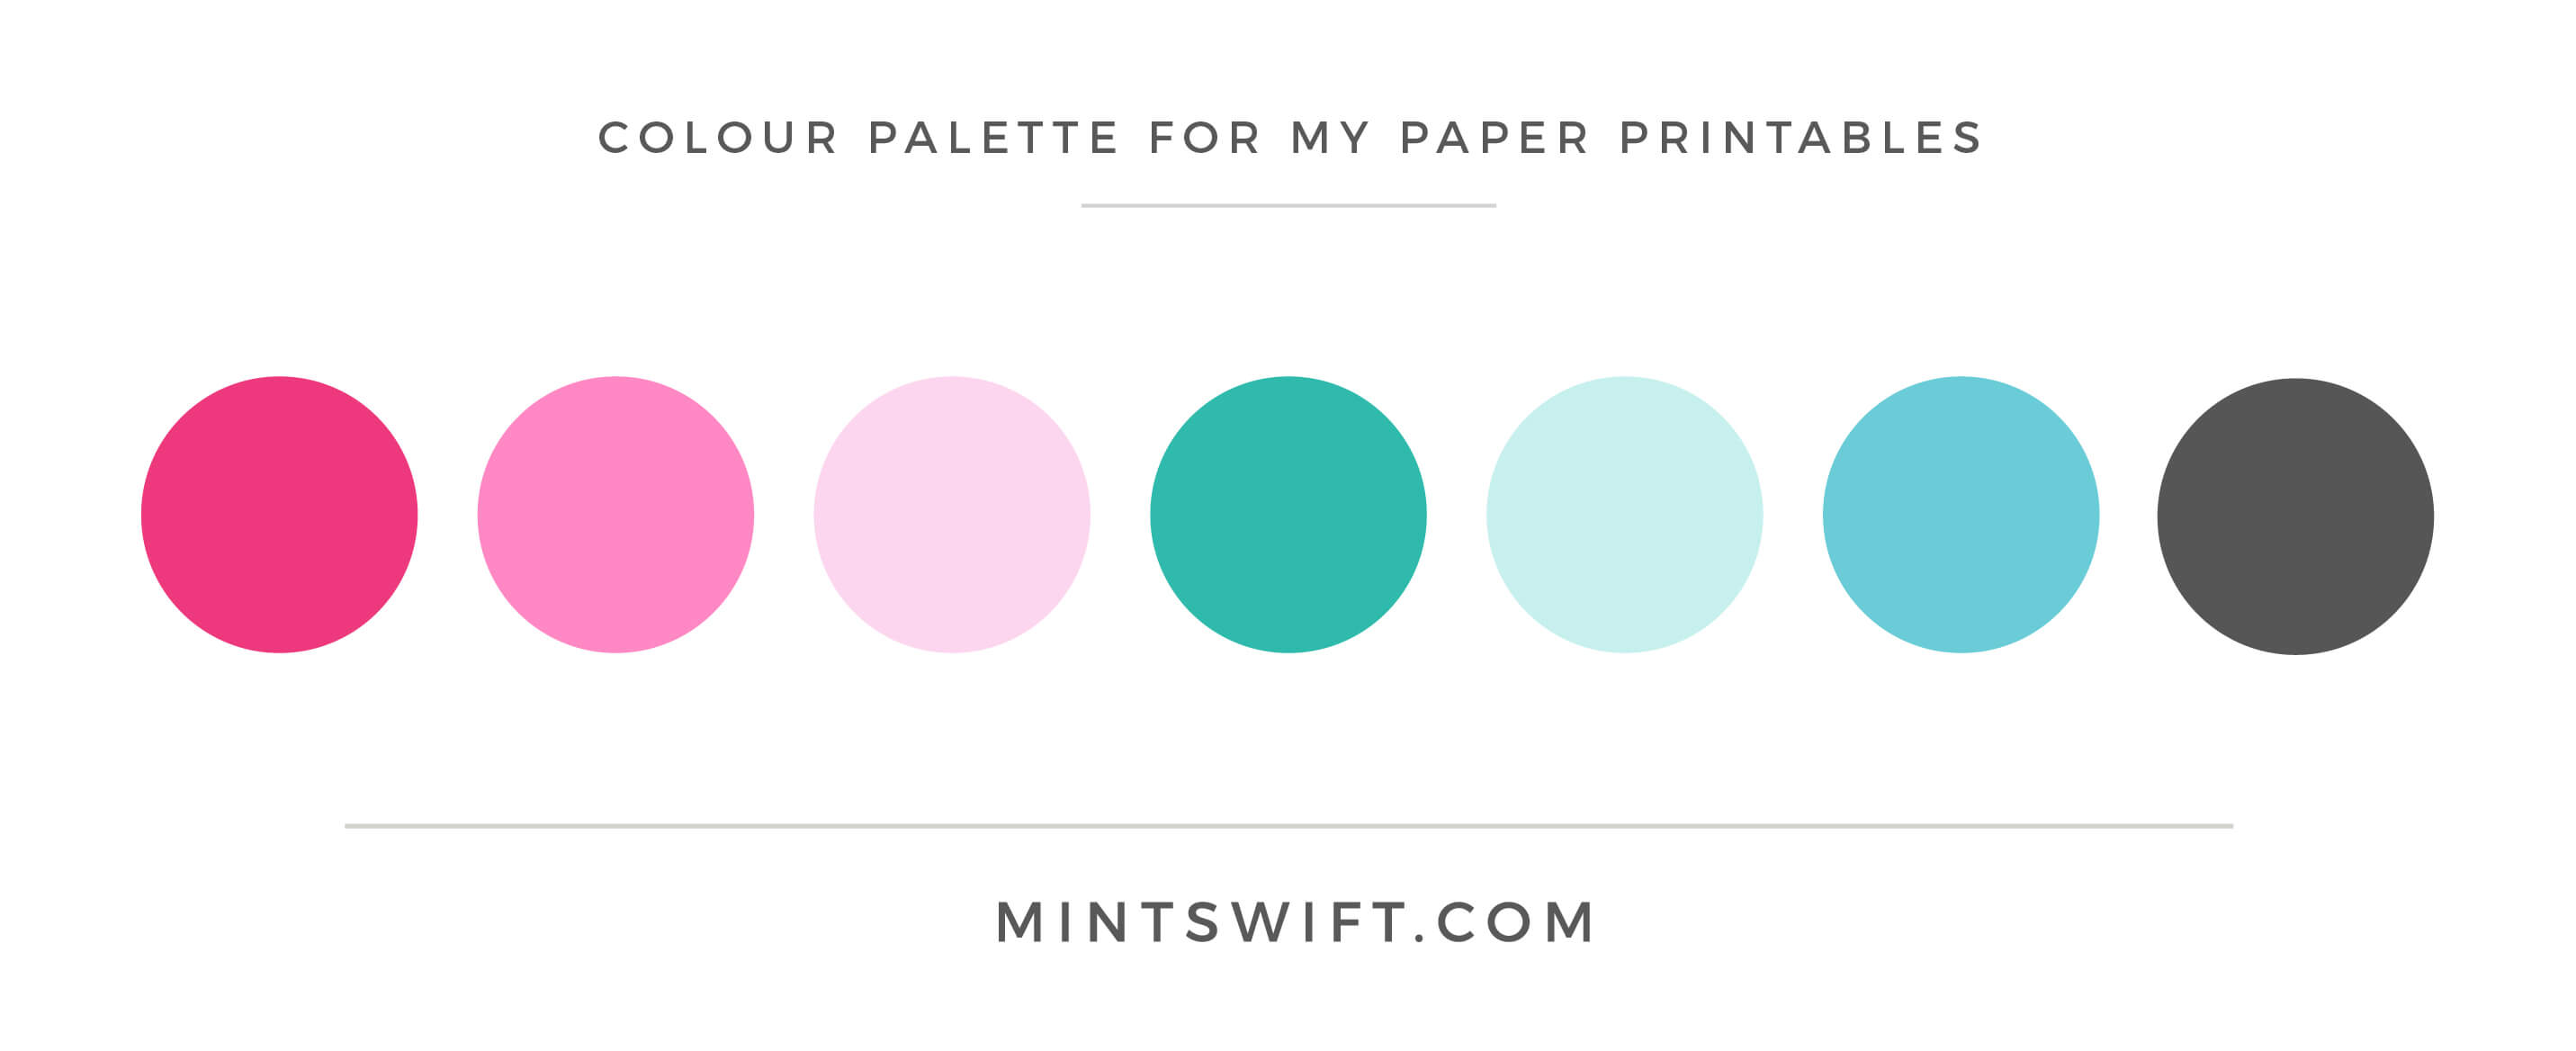 My Paper Printables - Colour Palette - Brand Design - MintSwift